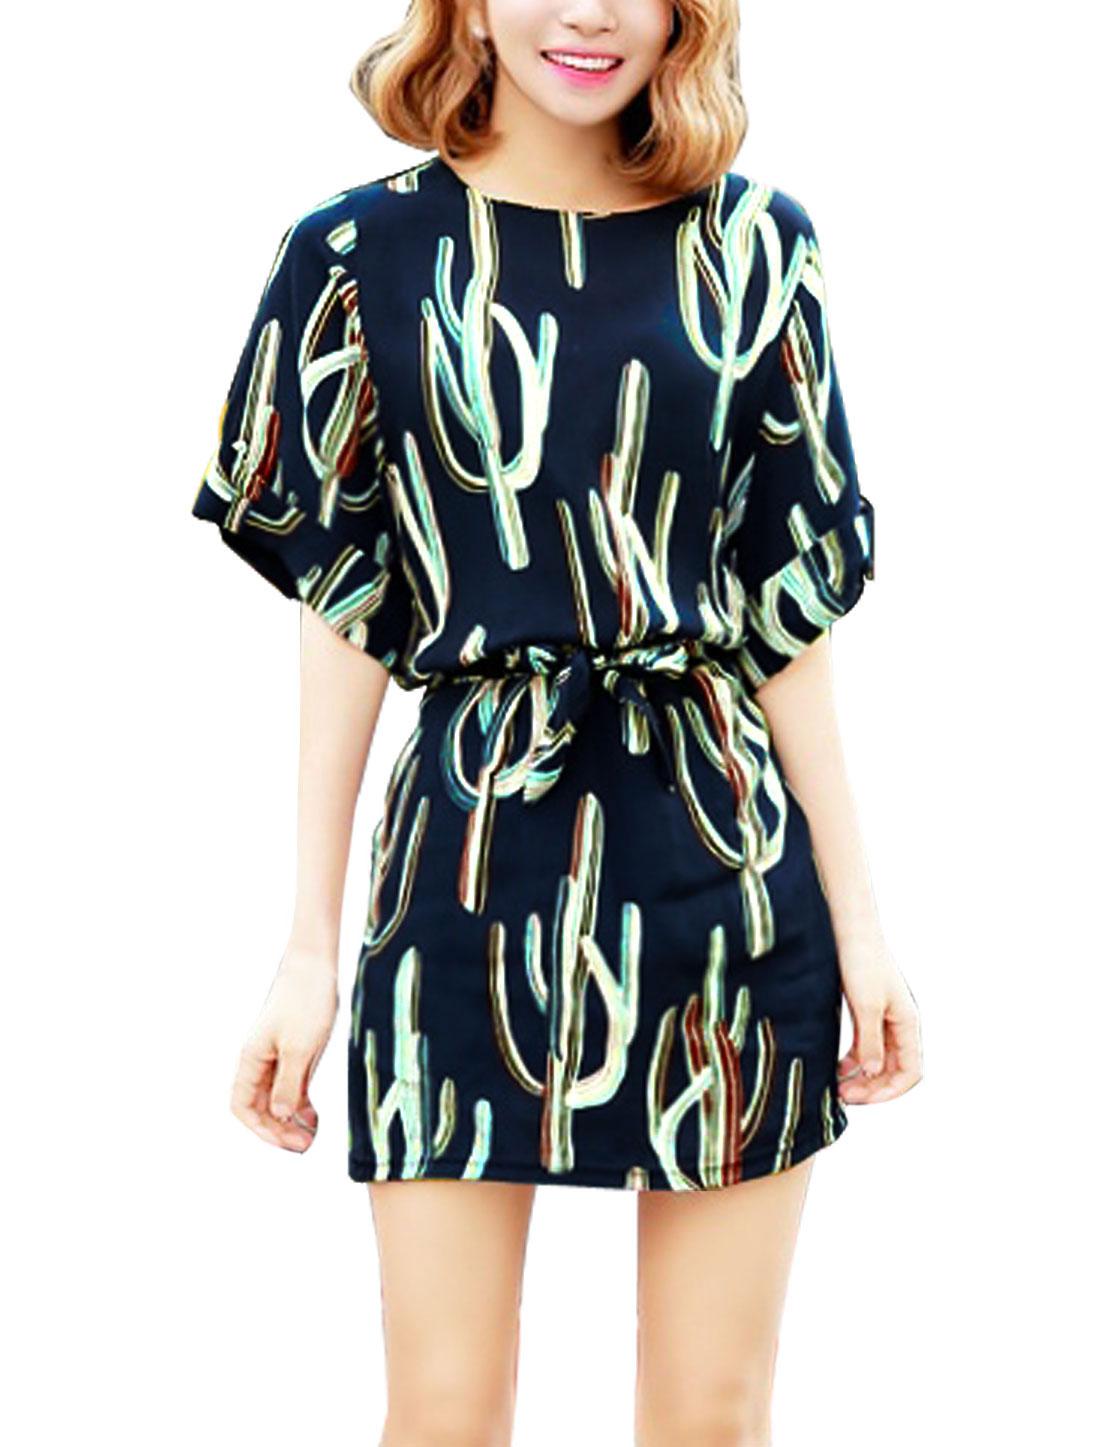 Women Elbow Sleeve Round Neck Novelty Print Casual Dress Navy Blue S